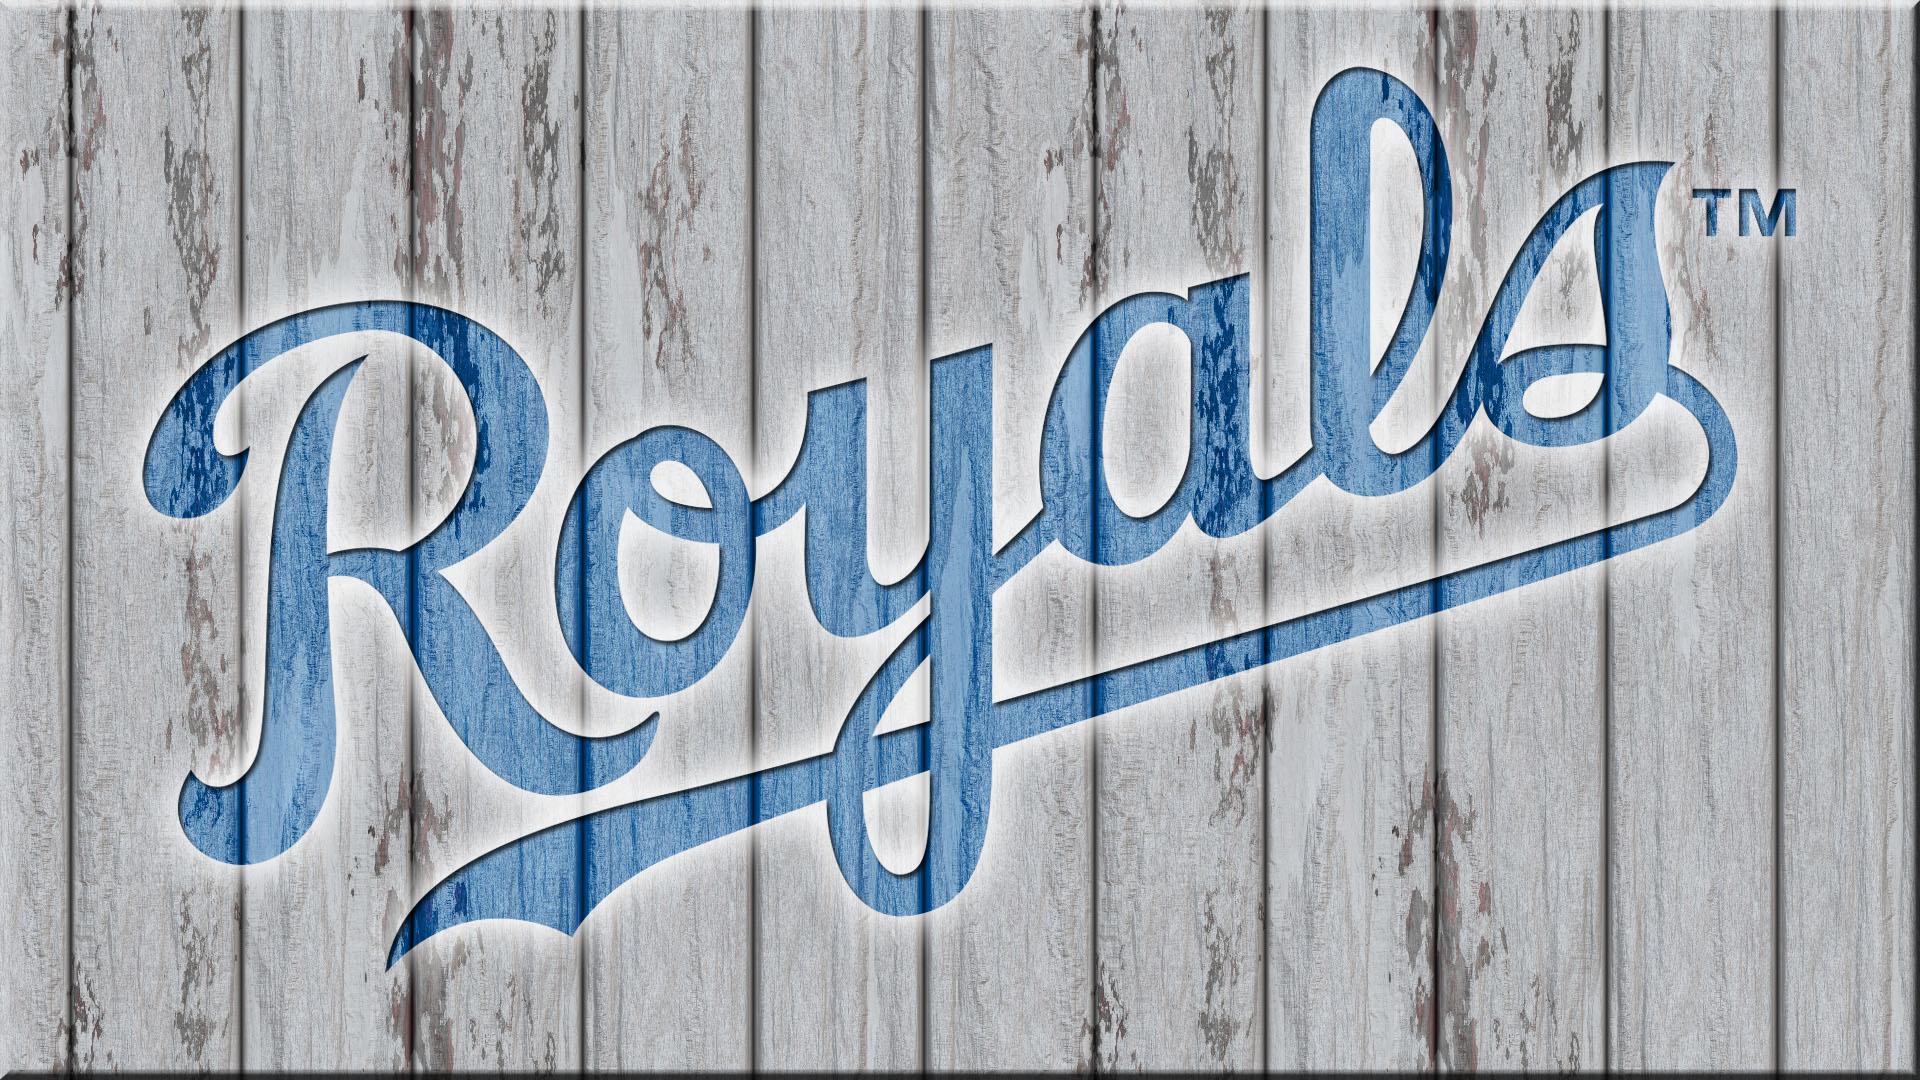 KANSAS CITY ROYALS mlb baseball 16 wallpaper background 1920x1080